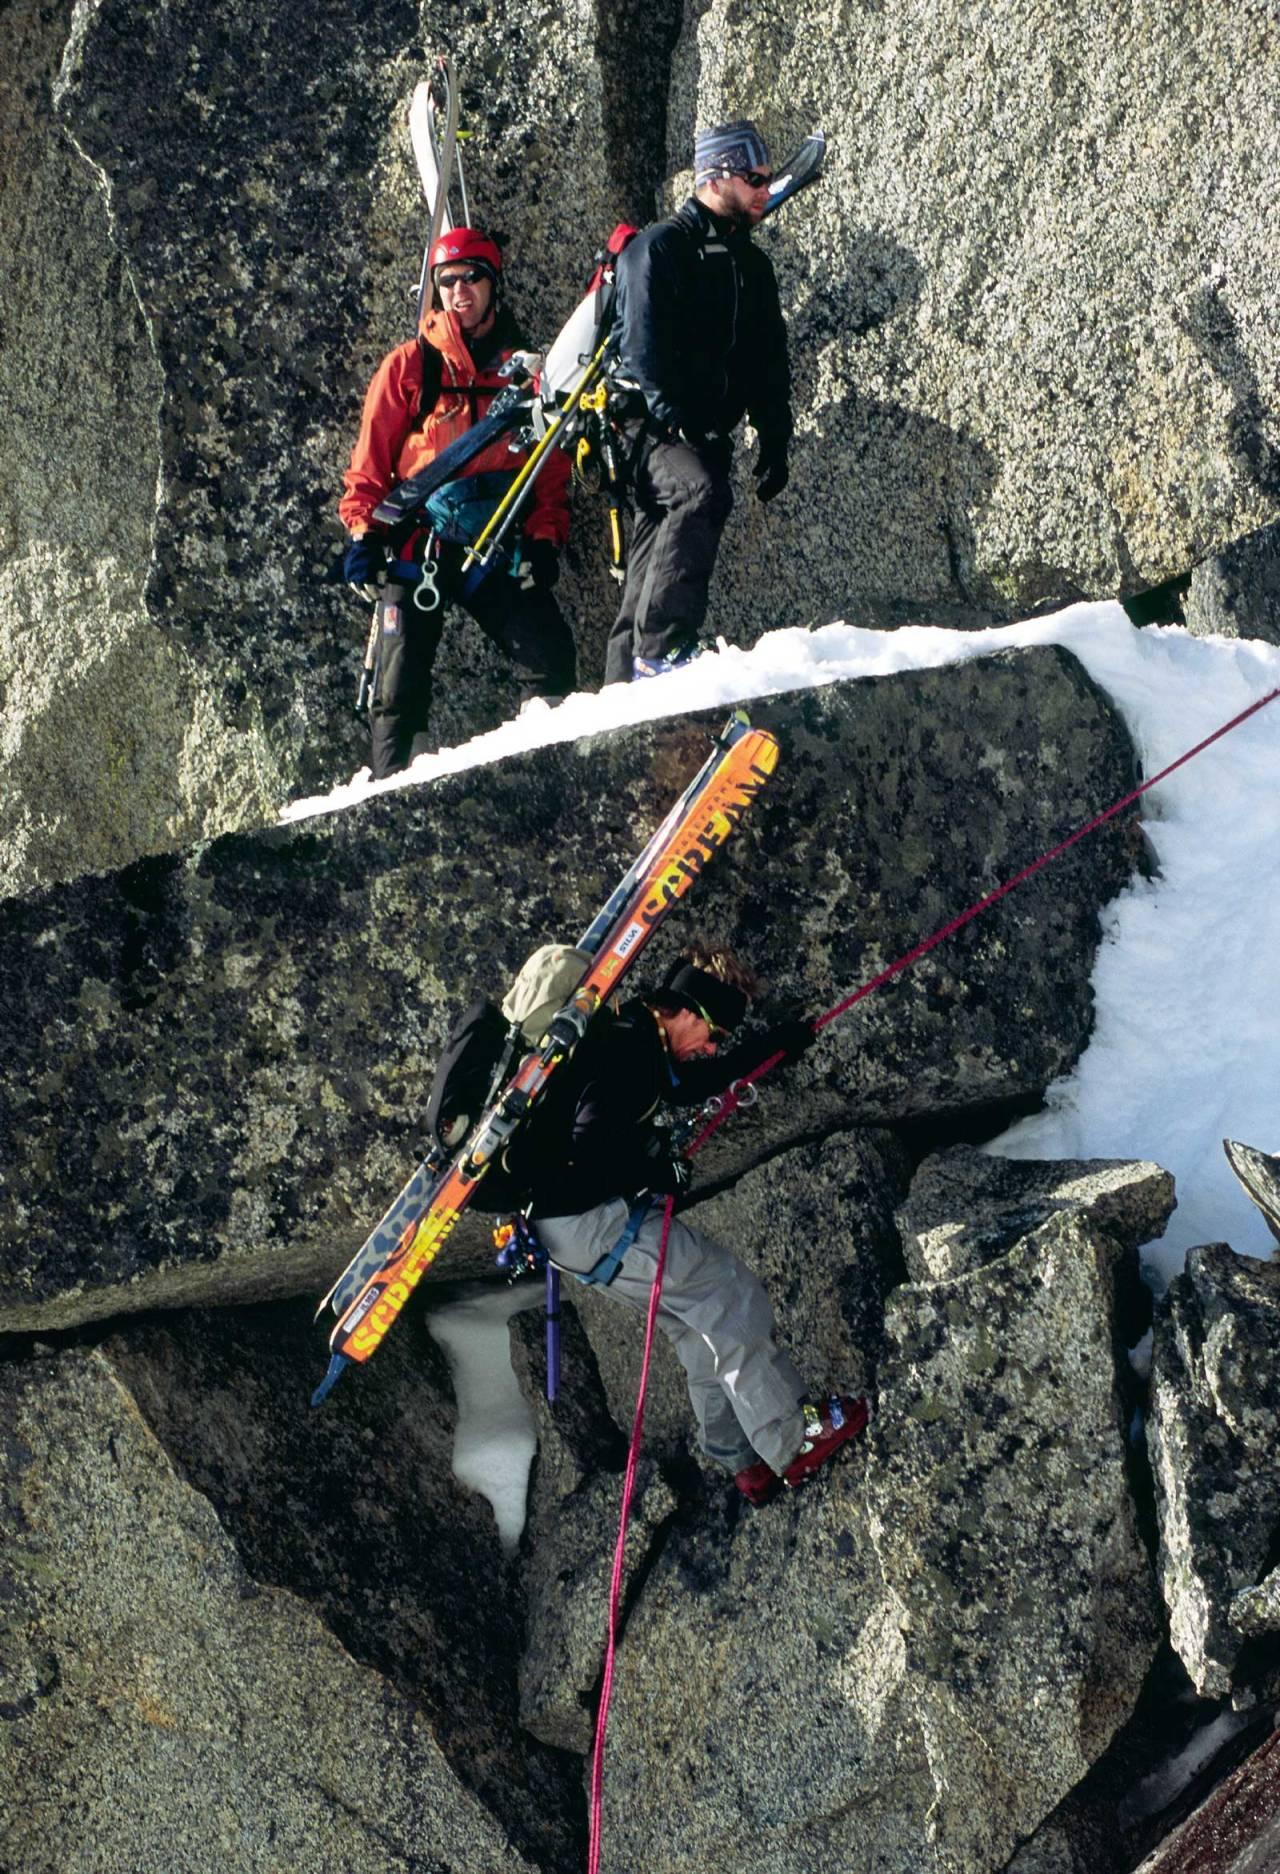 Mikael af Ekenstam på den korte rappellen halvveis langs eggen. Trond Solberg og Martin Morell venter på tur. Foto: Lars Thulin / Toppturer rundt Narvik.